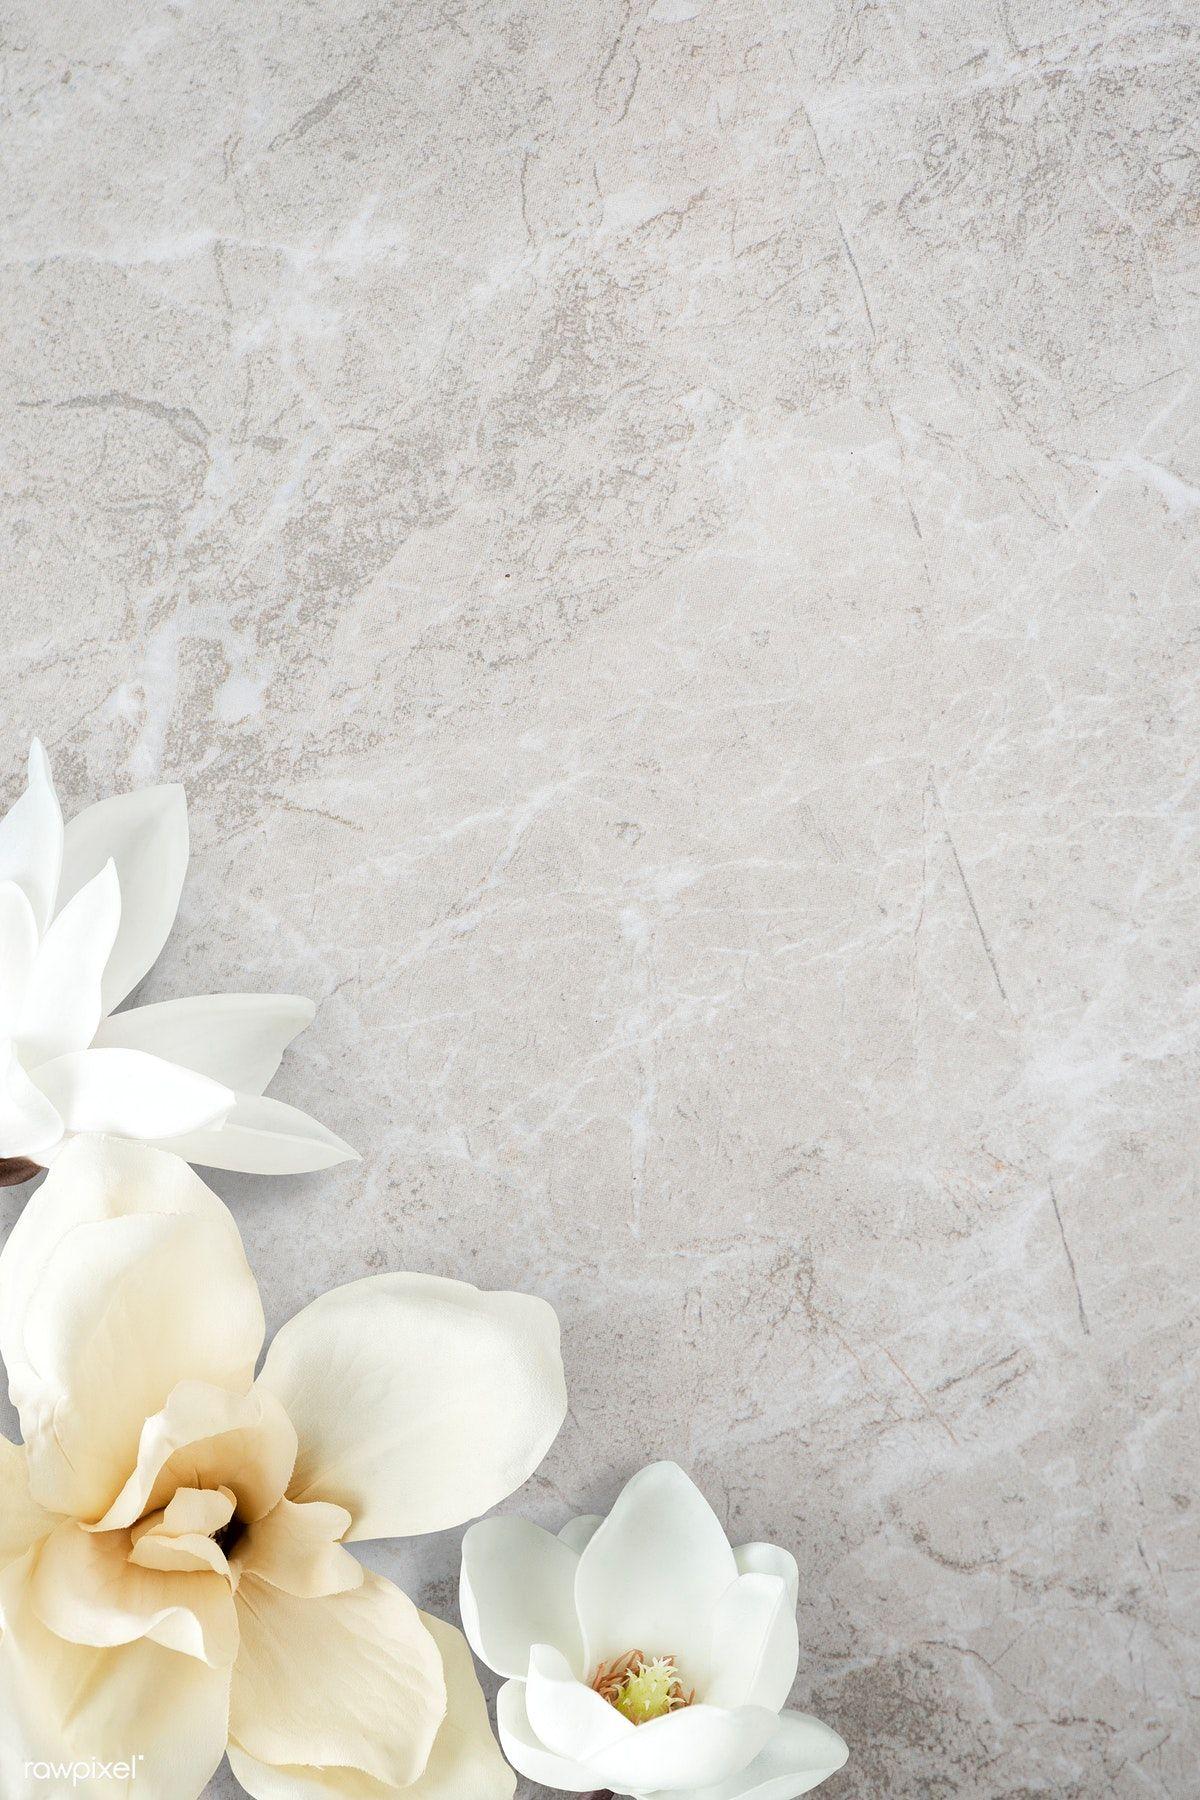 Download Premium Psd Of White Magnolia Pattern Background 1204187 Flower Backgrounds Background Patterns Flower Background Iphone Flower theme wallpaper images